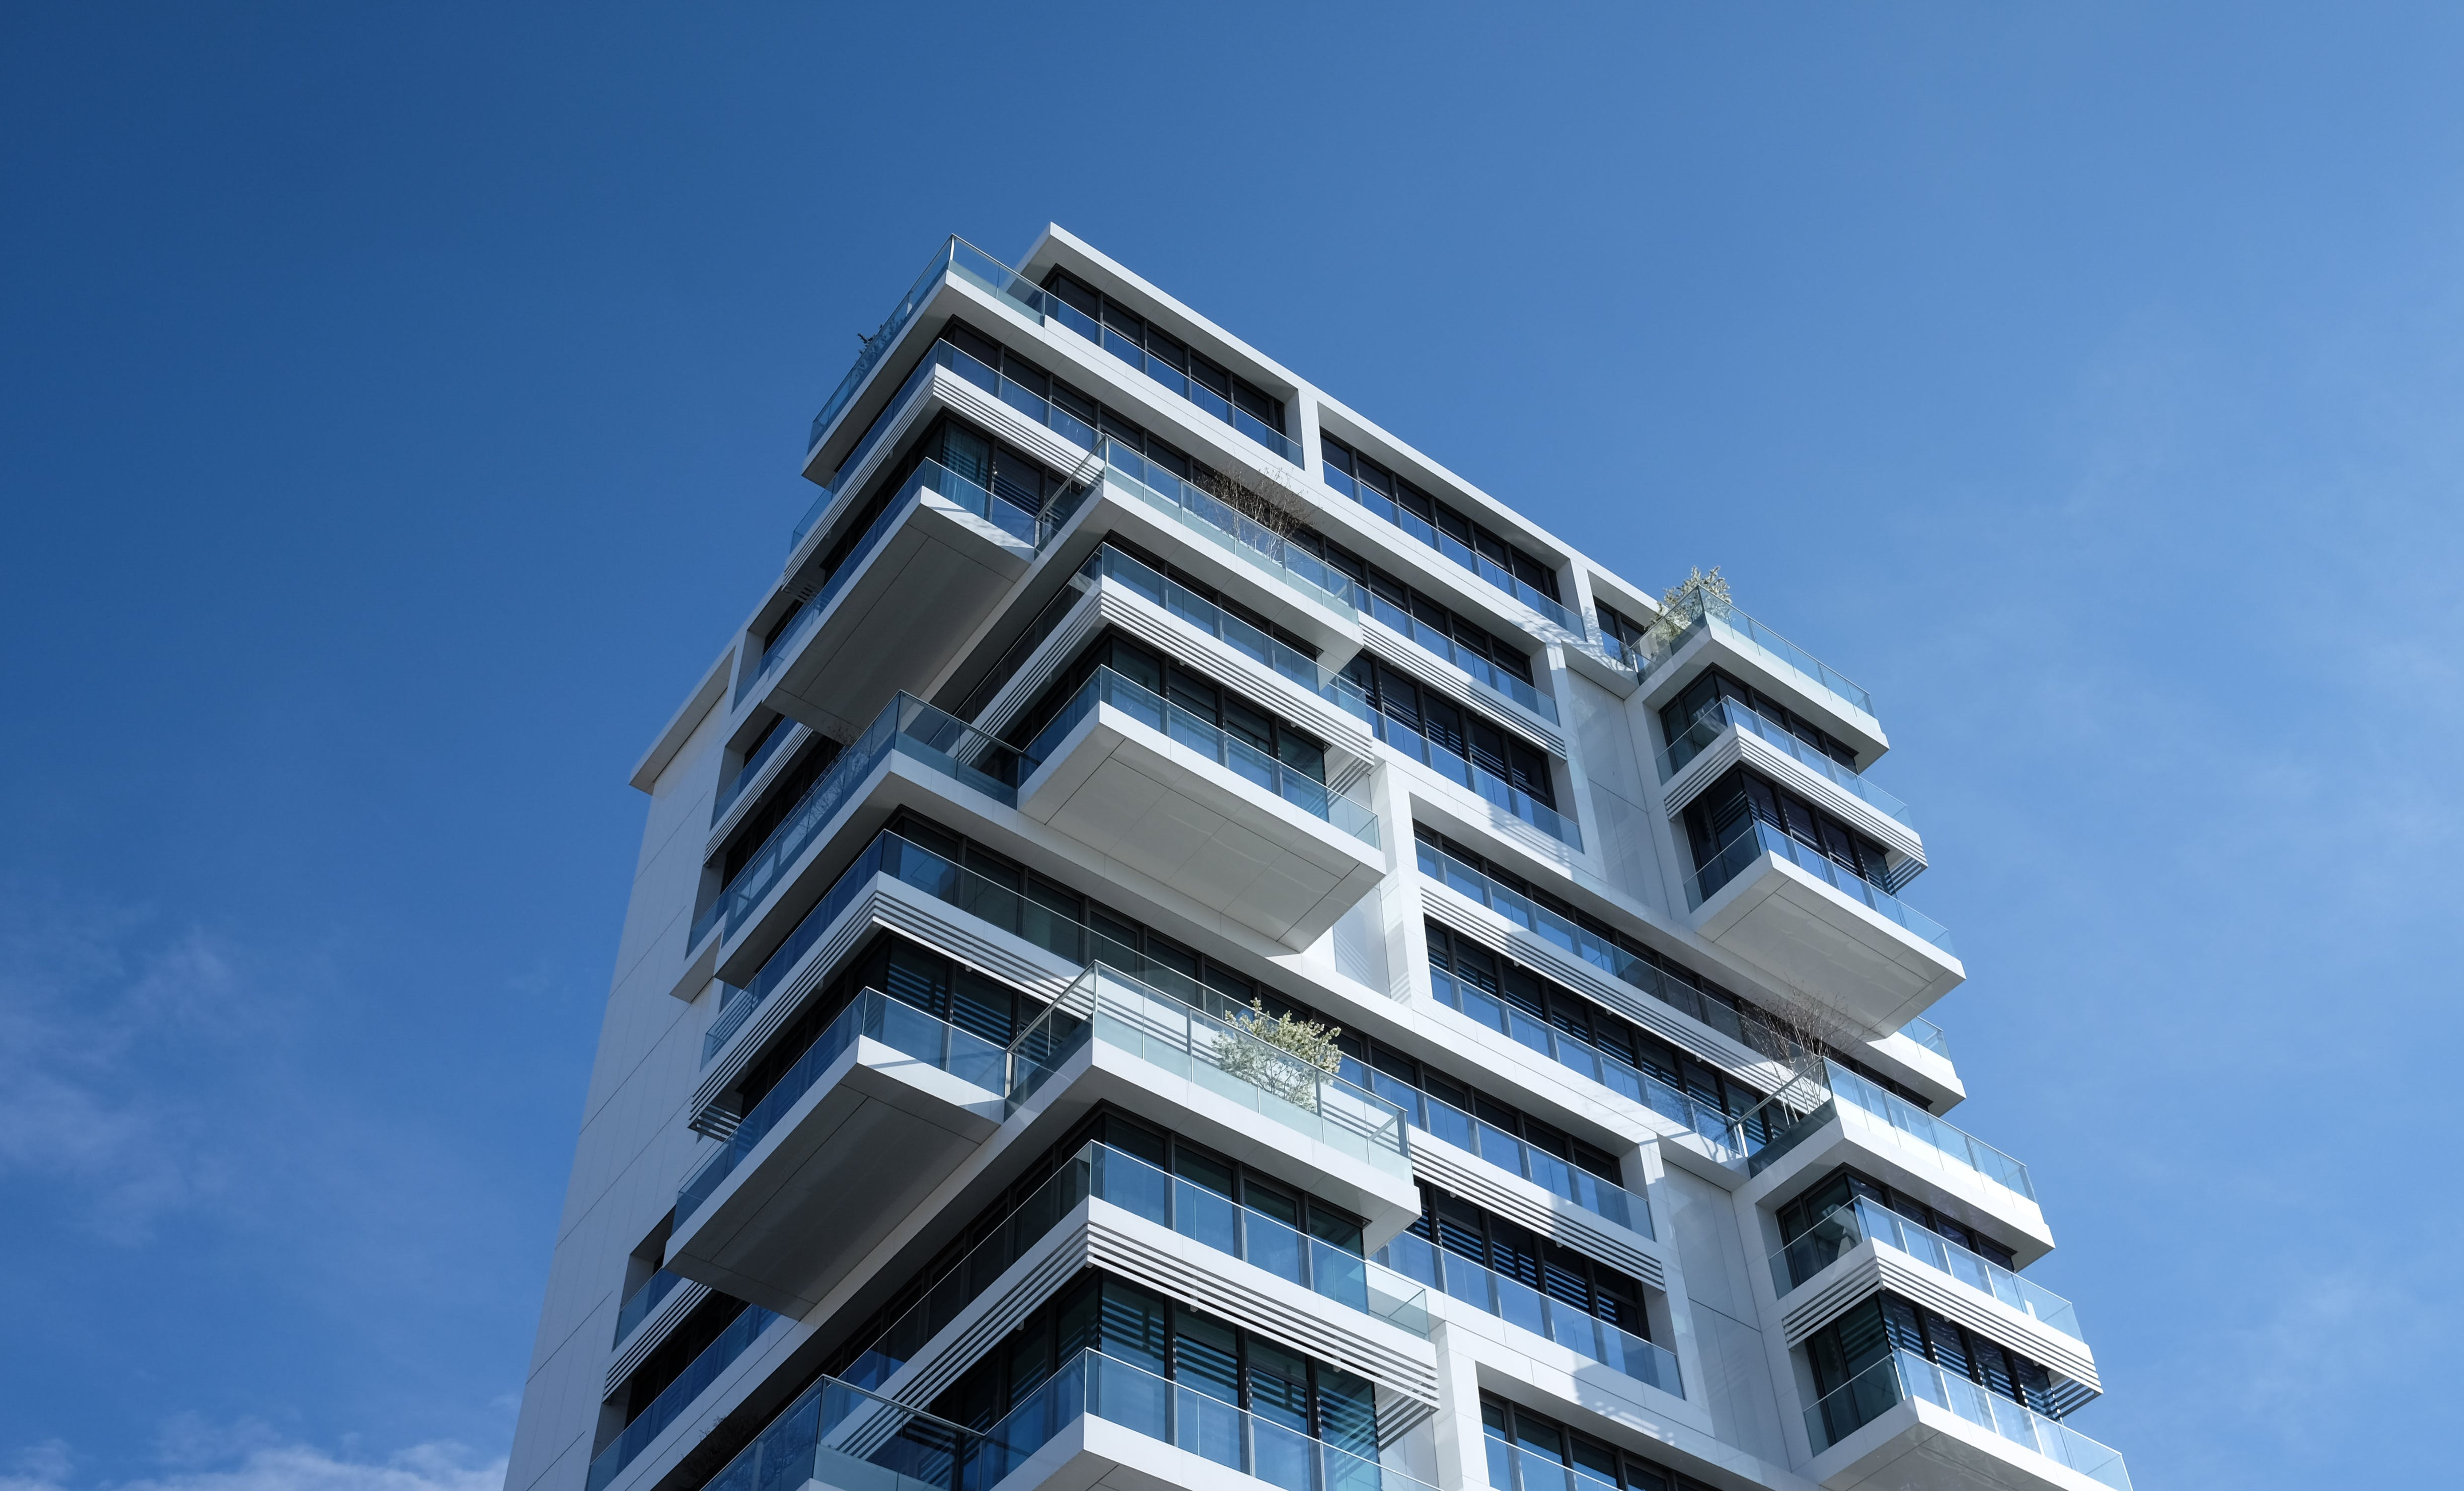 appartments, architektur, balkone